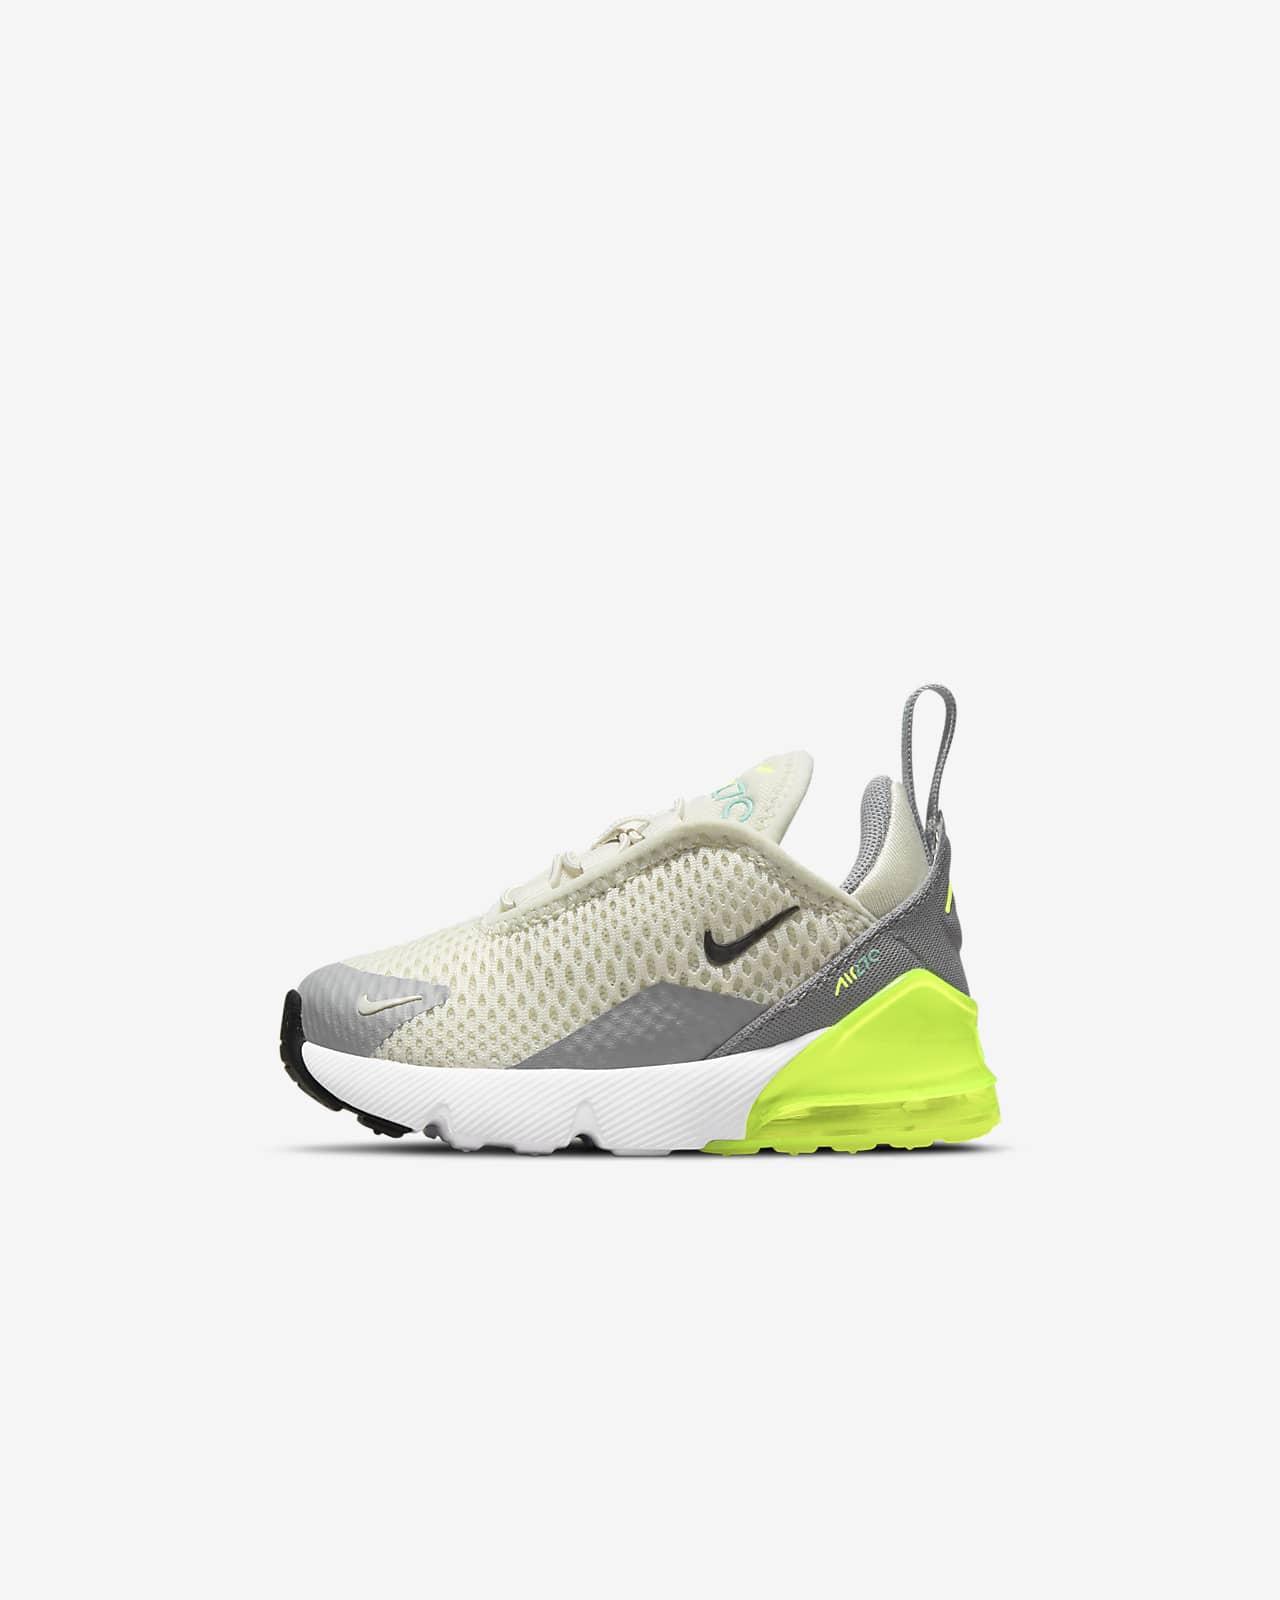 Nike Air Max 270-sko til babyer/småbørn